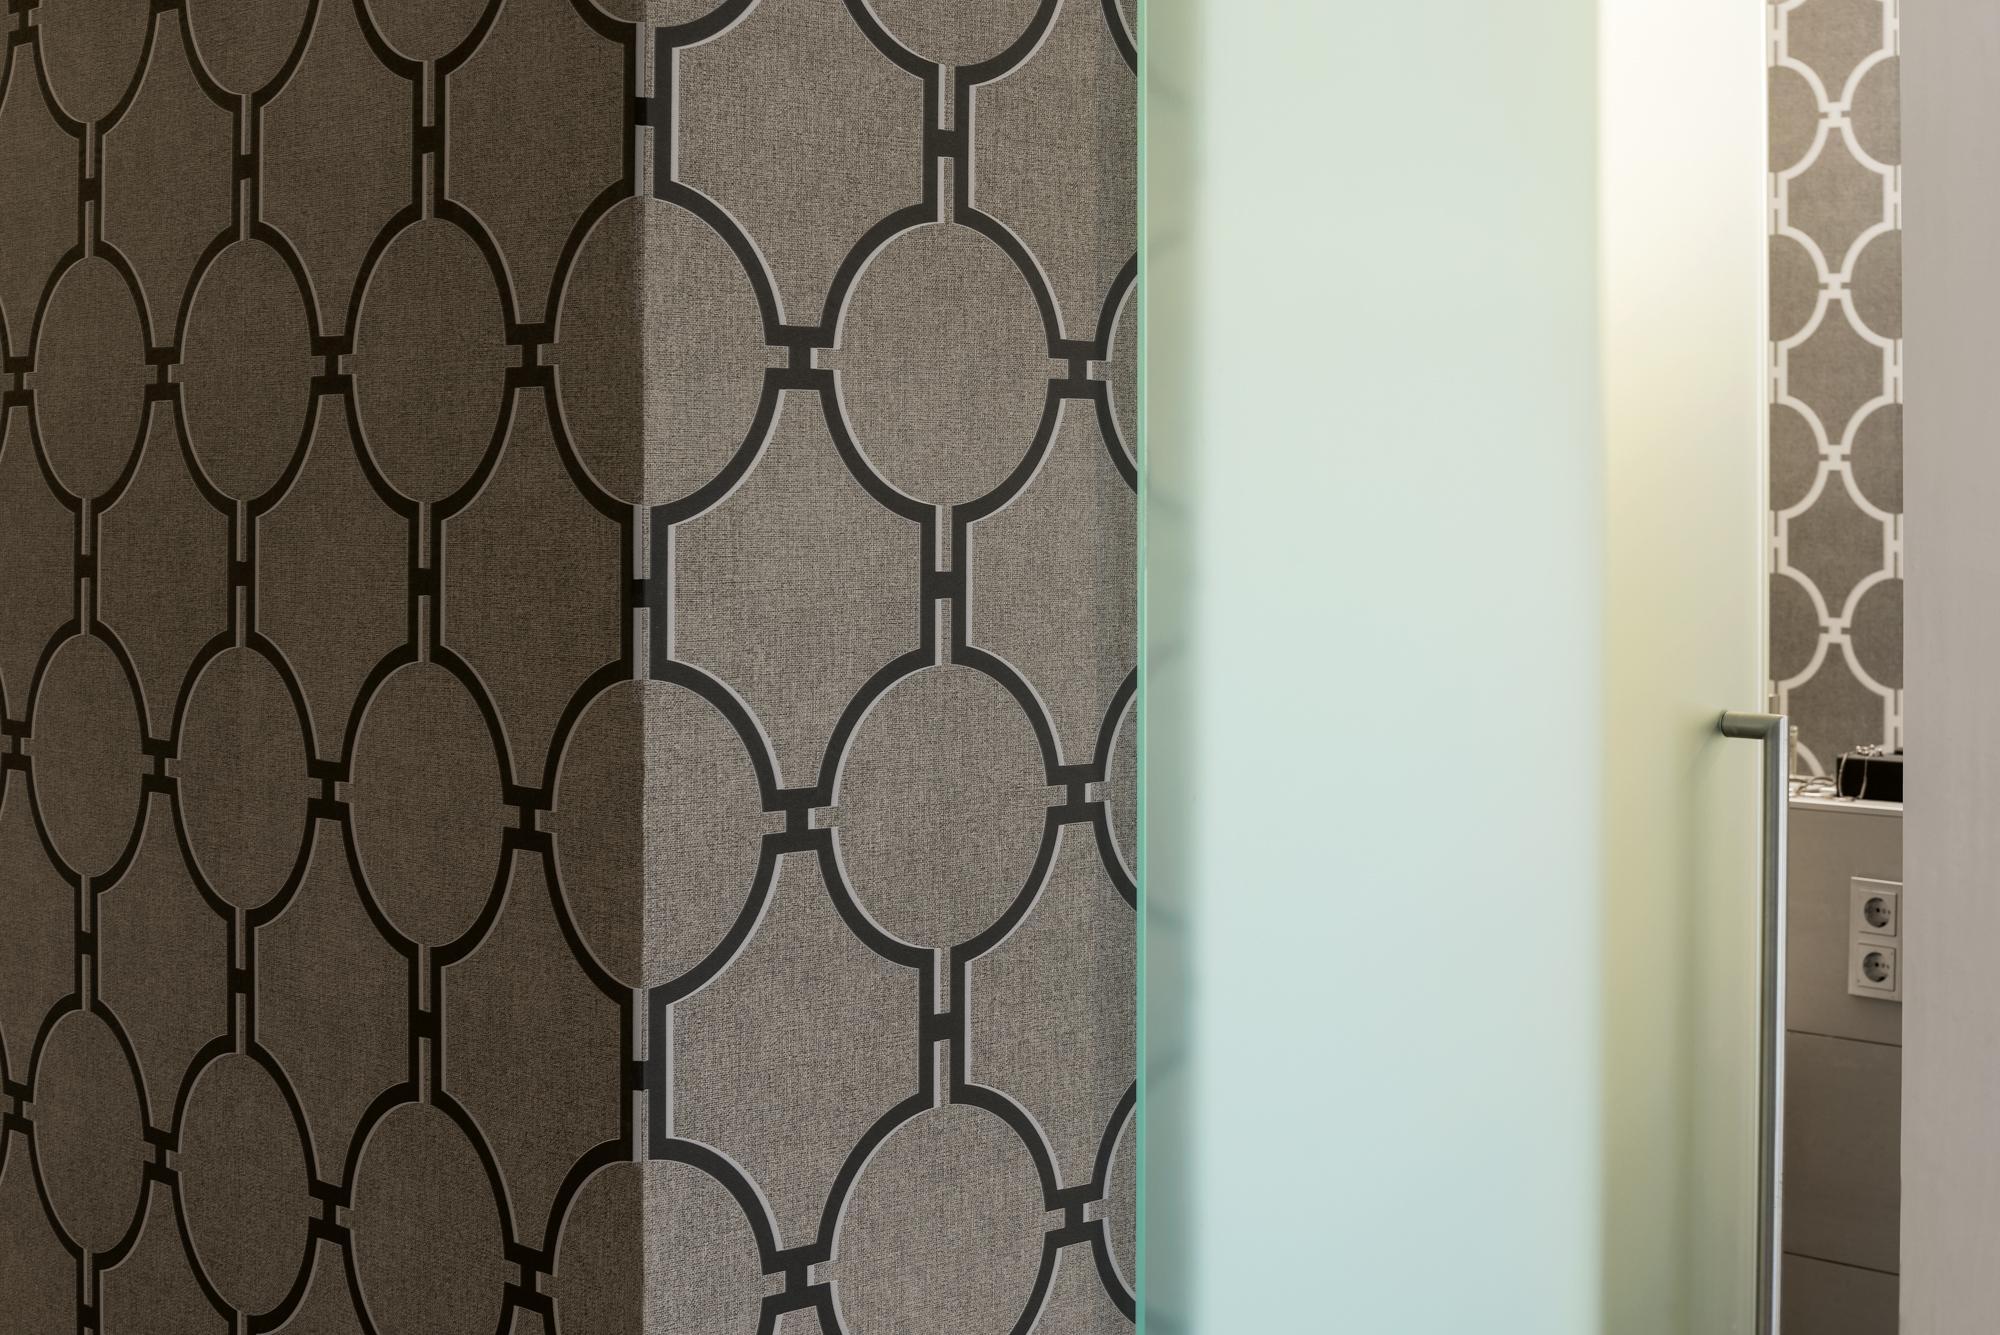 Vlies Tapete Vintage Grafik Kreise braun grau 36149-4 Elegance 5th Avenue